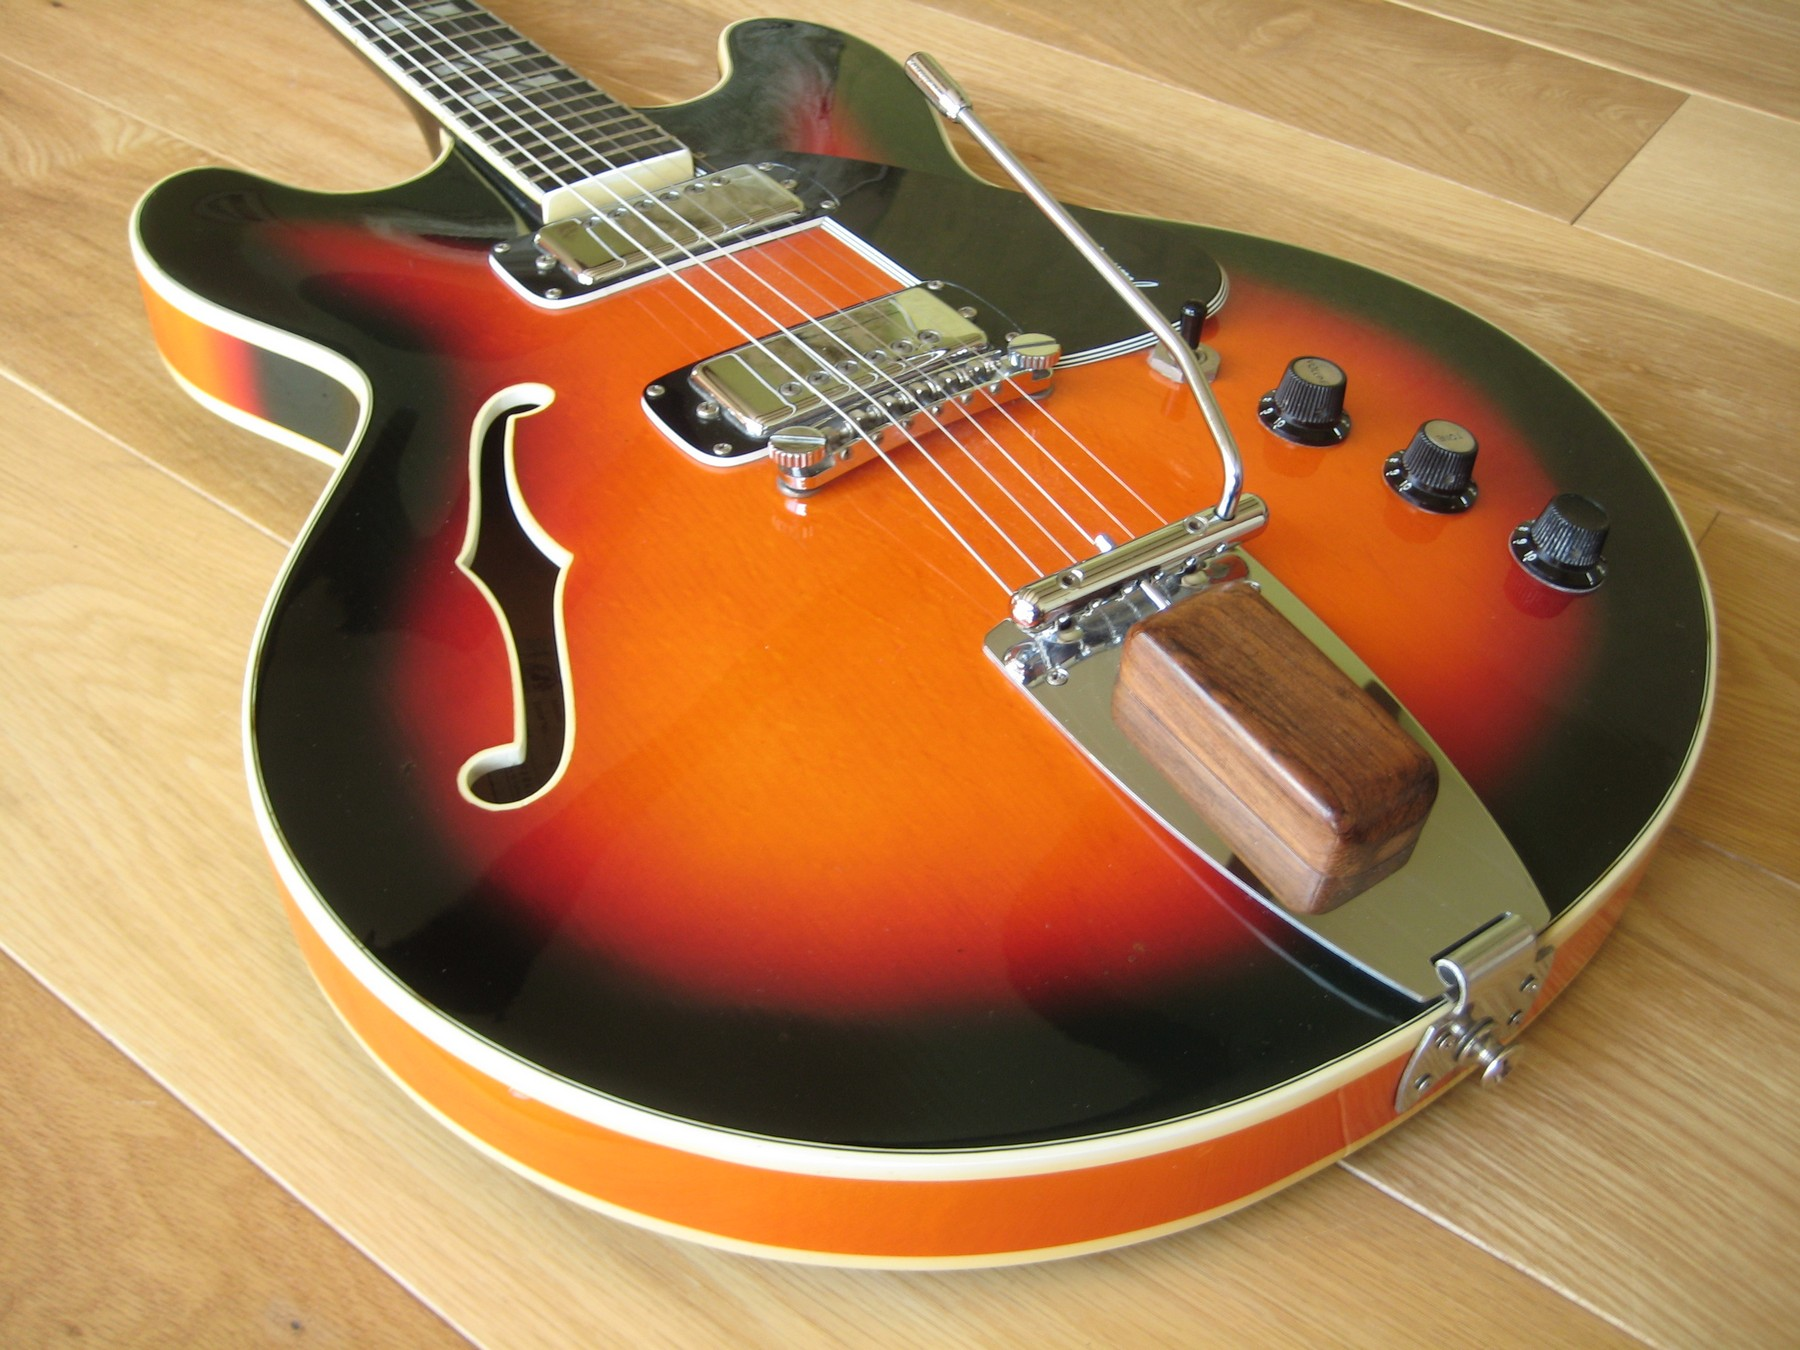 1972 Framus Billy Lorento Semi Acoustic Guitar 163 200 Off